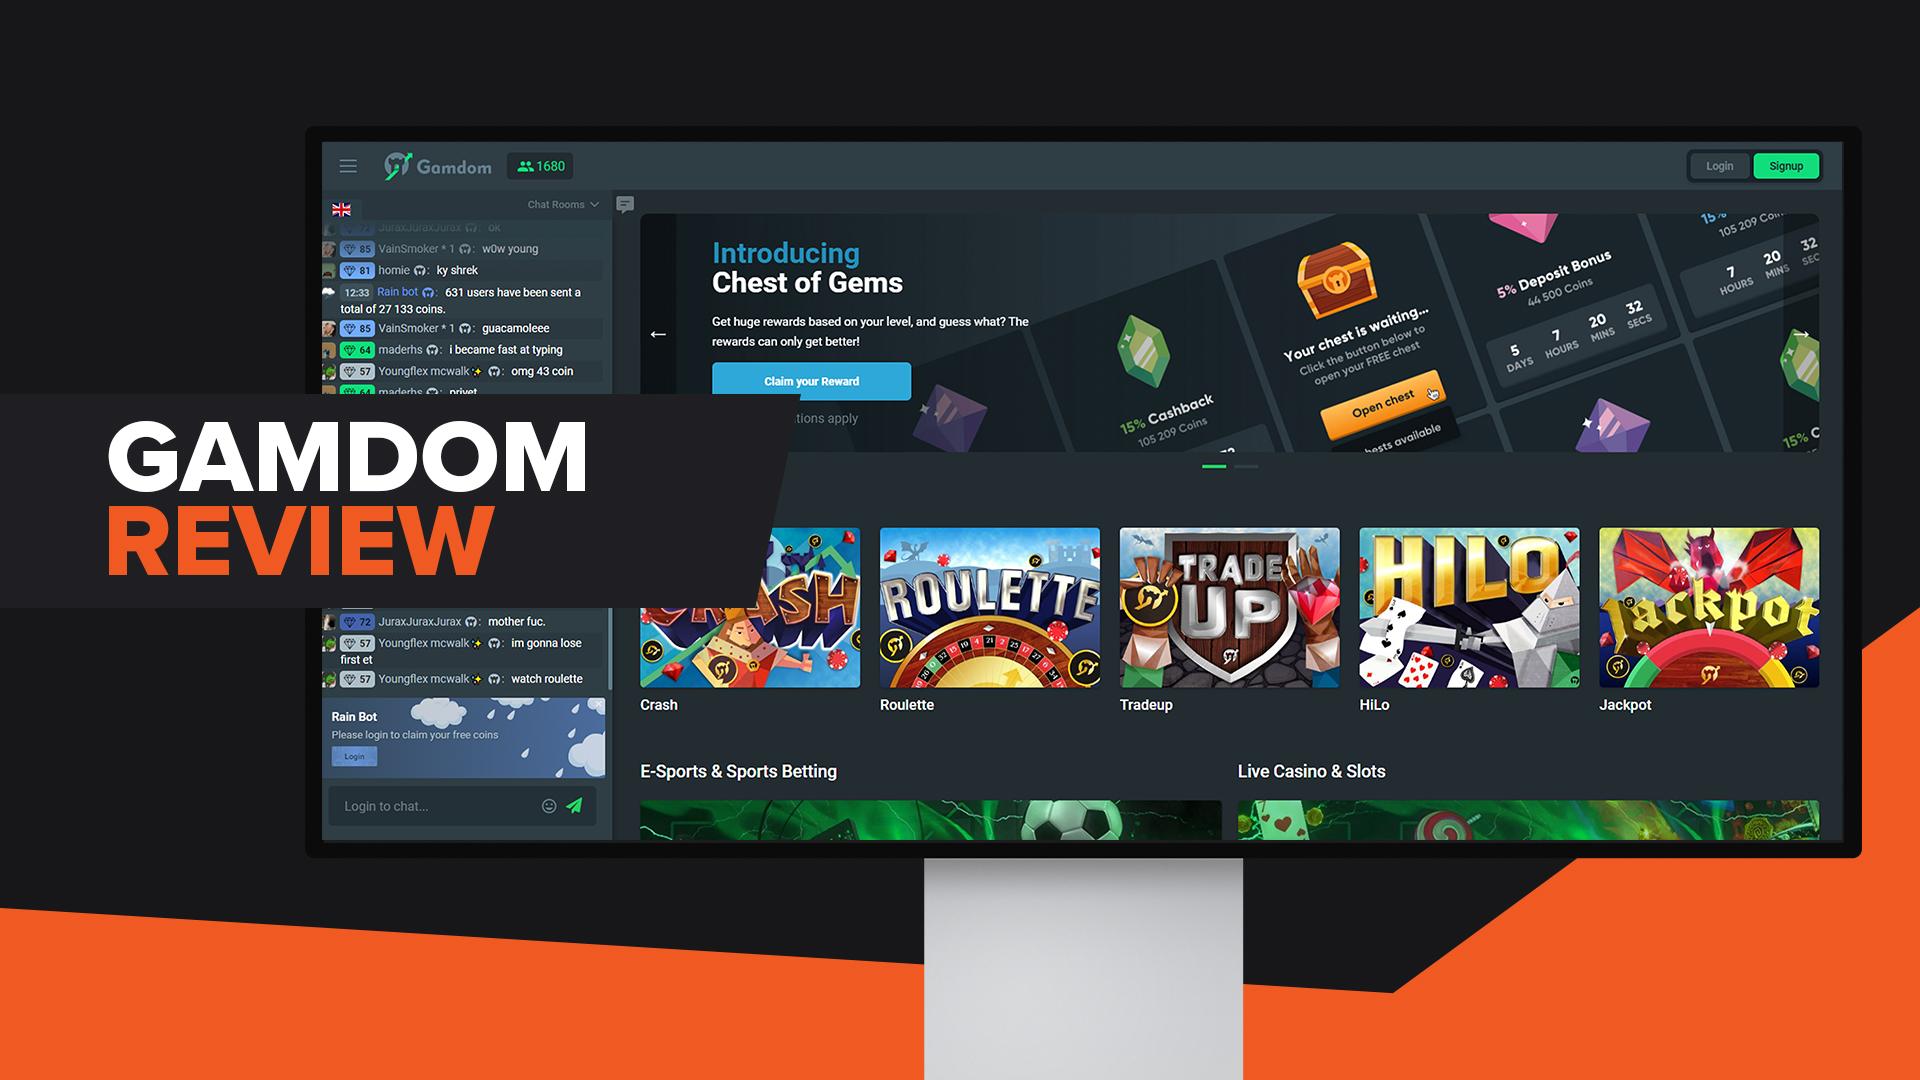 CSGO Gambling Sites Gamdom